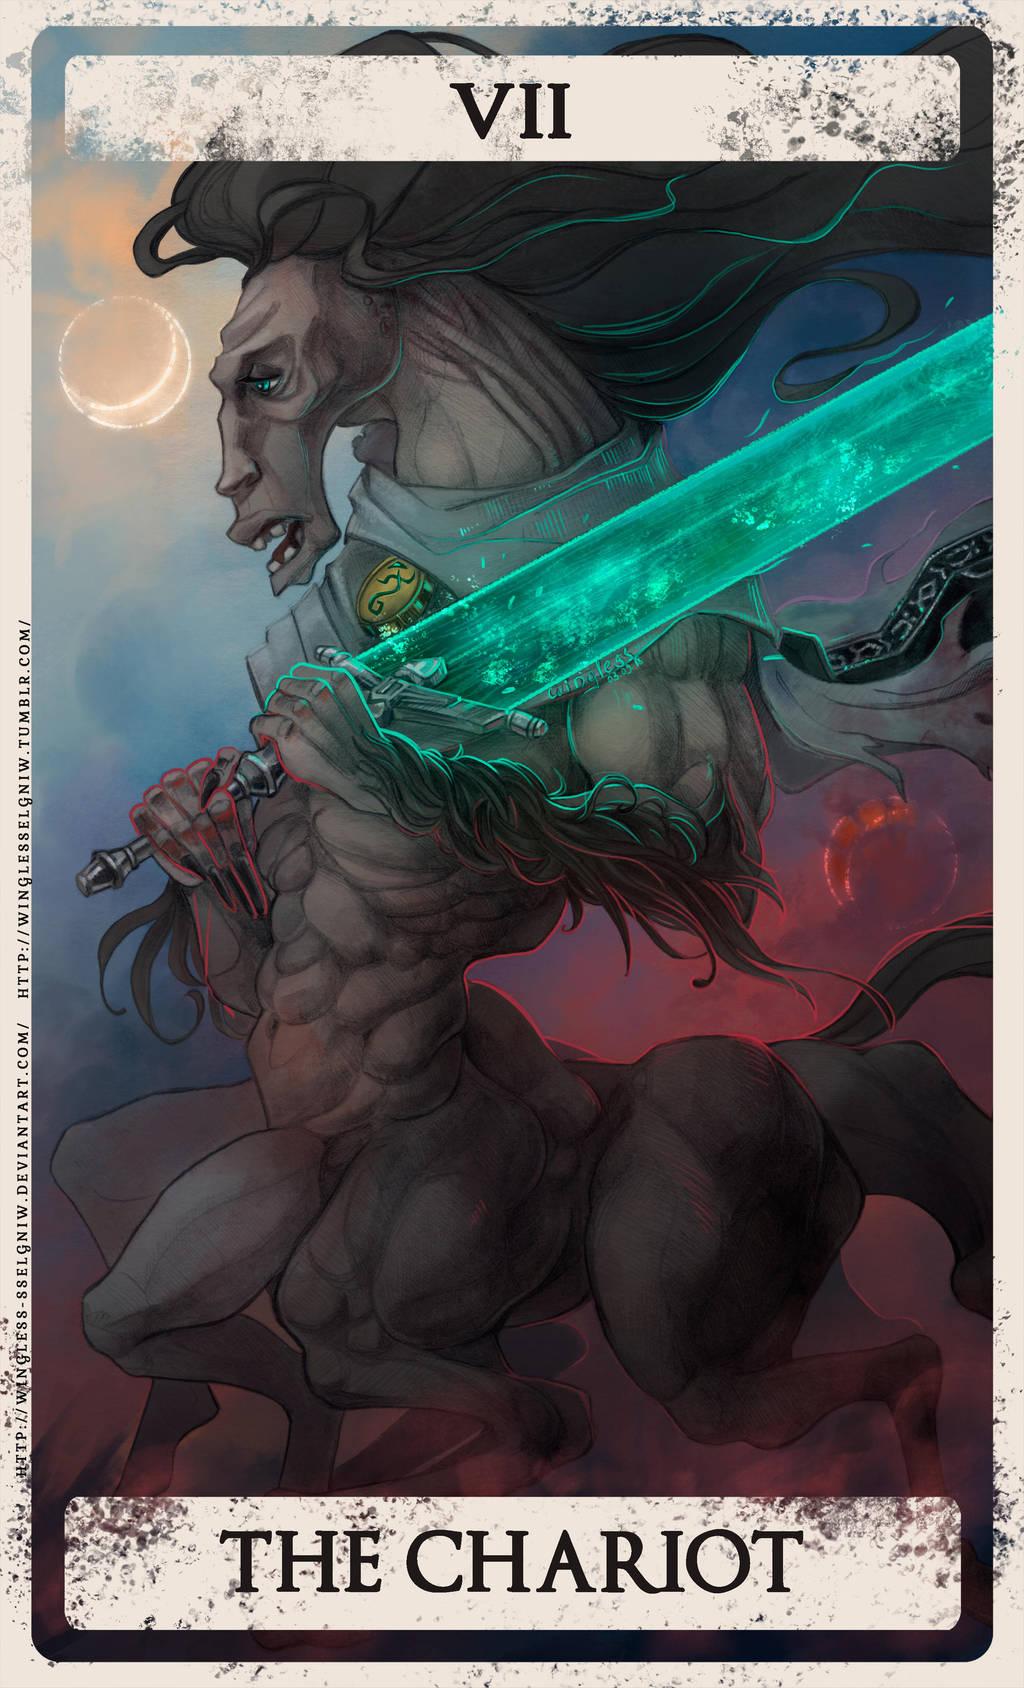 Bloodborne tarot VII by Wingless-sselgniW